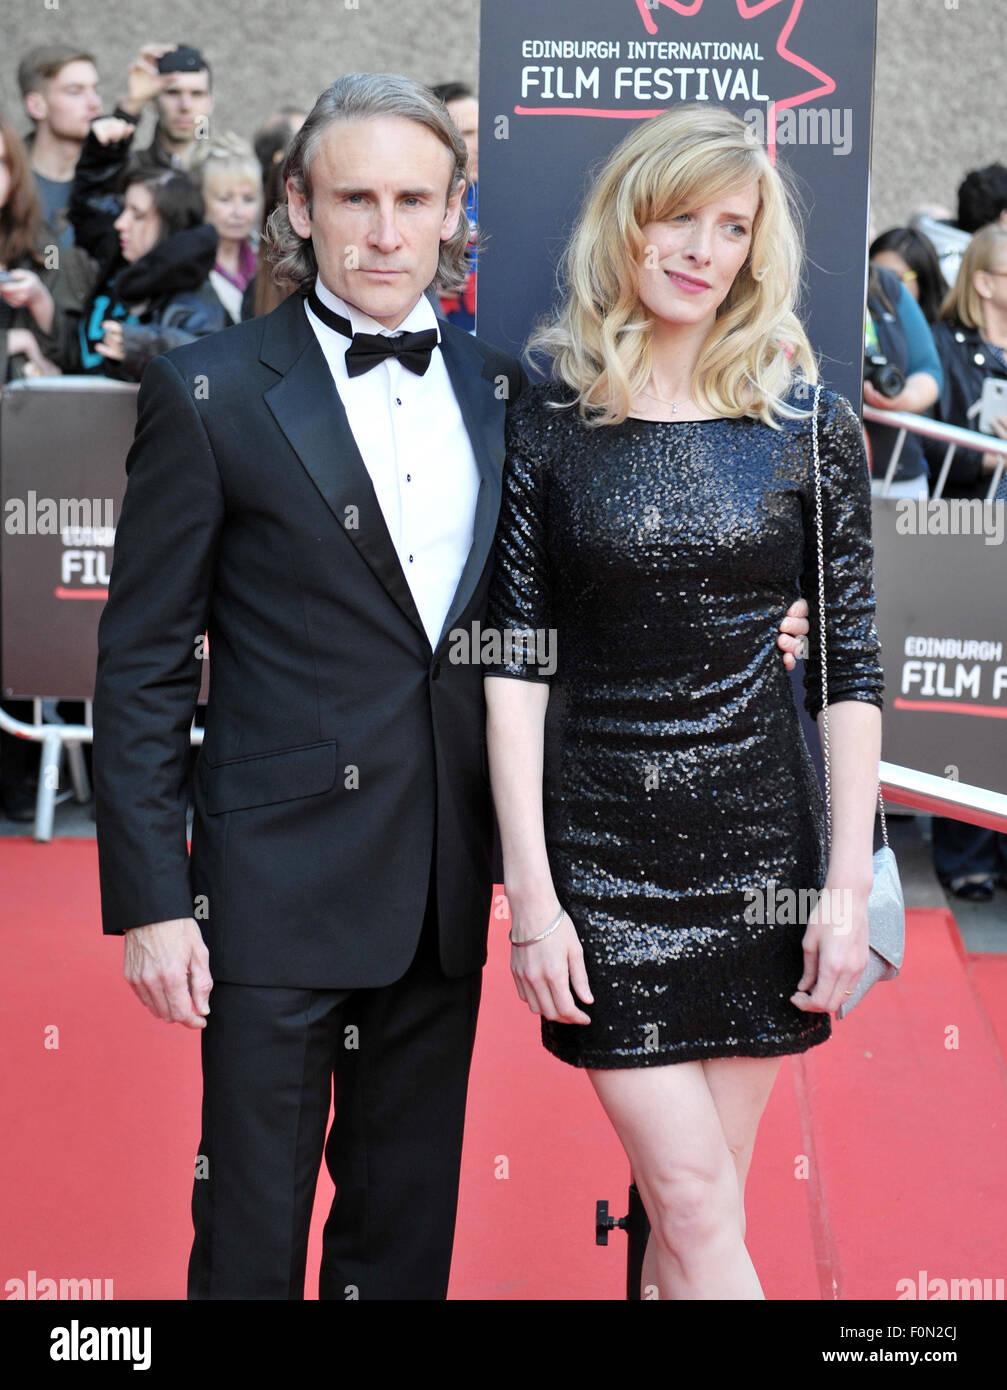 Arrivals at the Edinburgh International Film Festival ...